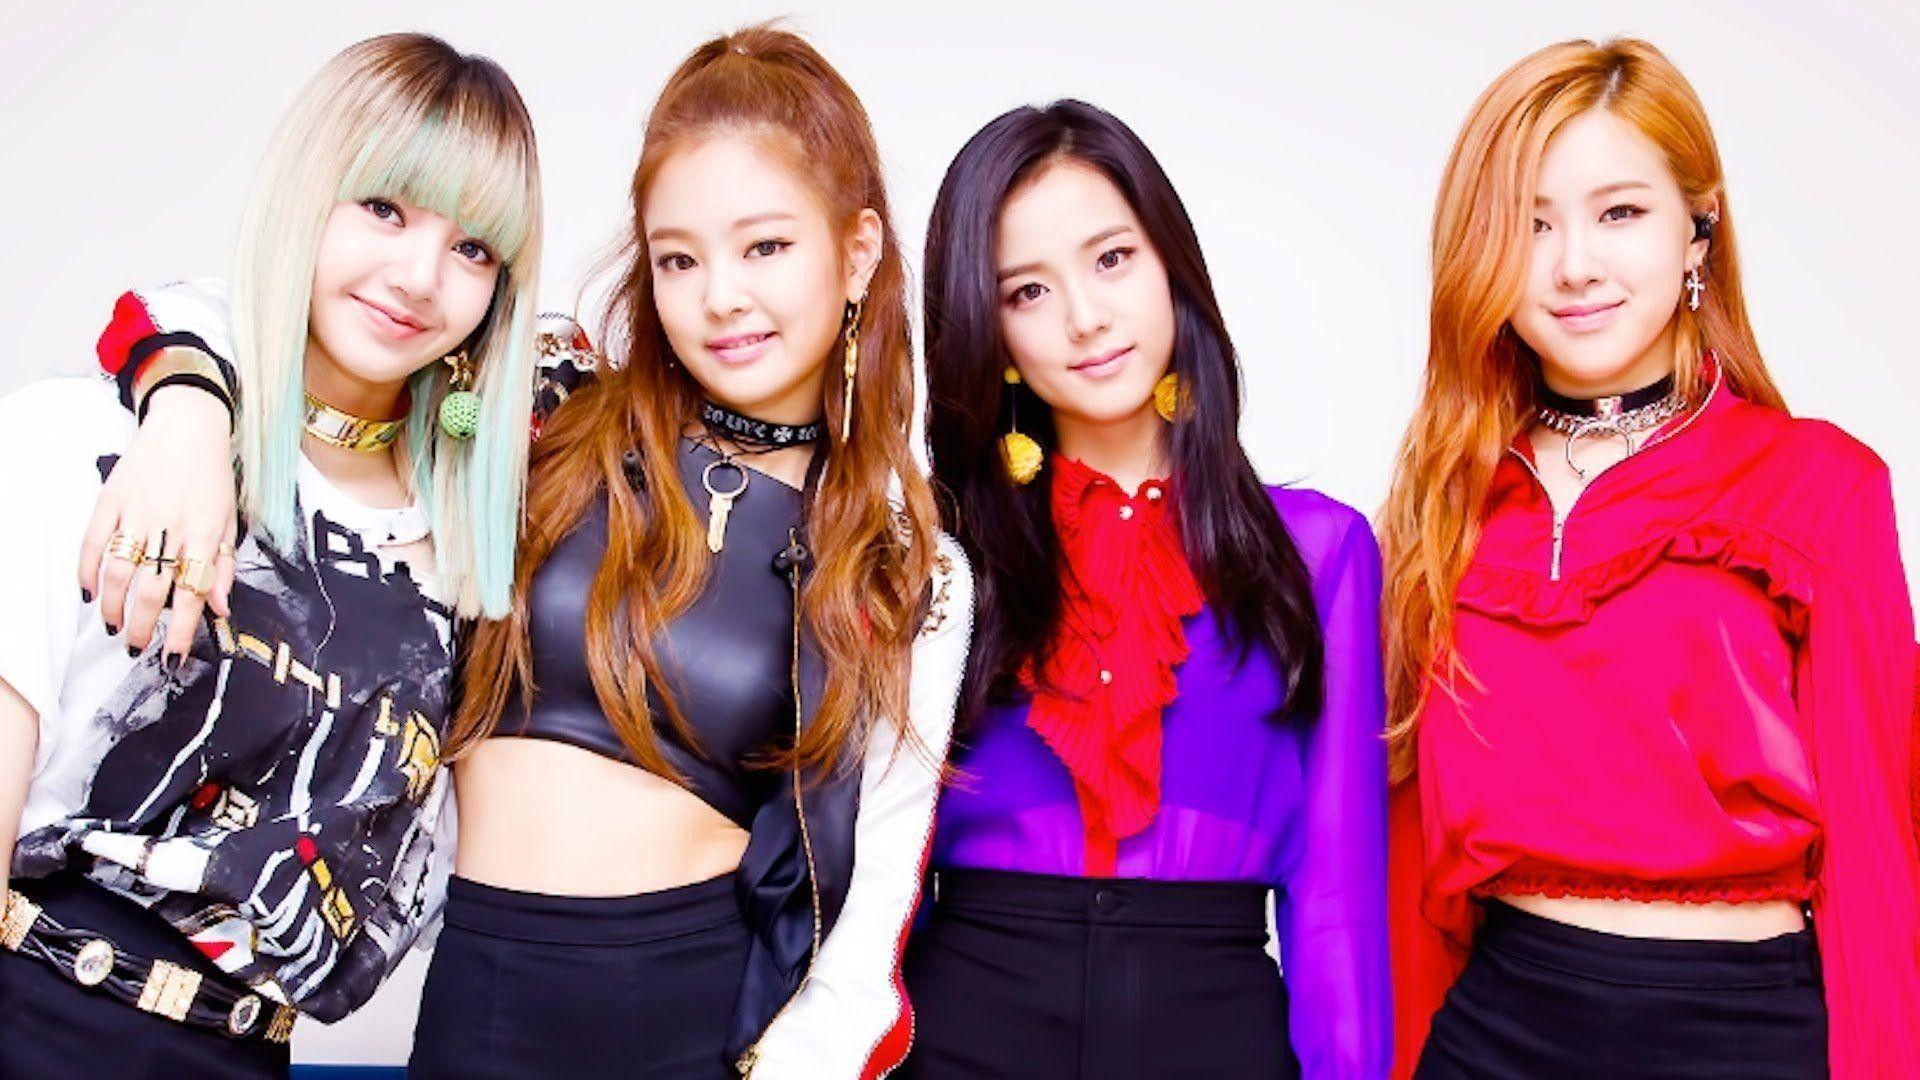 Best Blackpink Wallpaper Hd 2020 Live Wallpaper Hd Black Pink Blackpink Kpop Girls